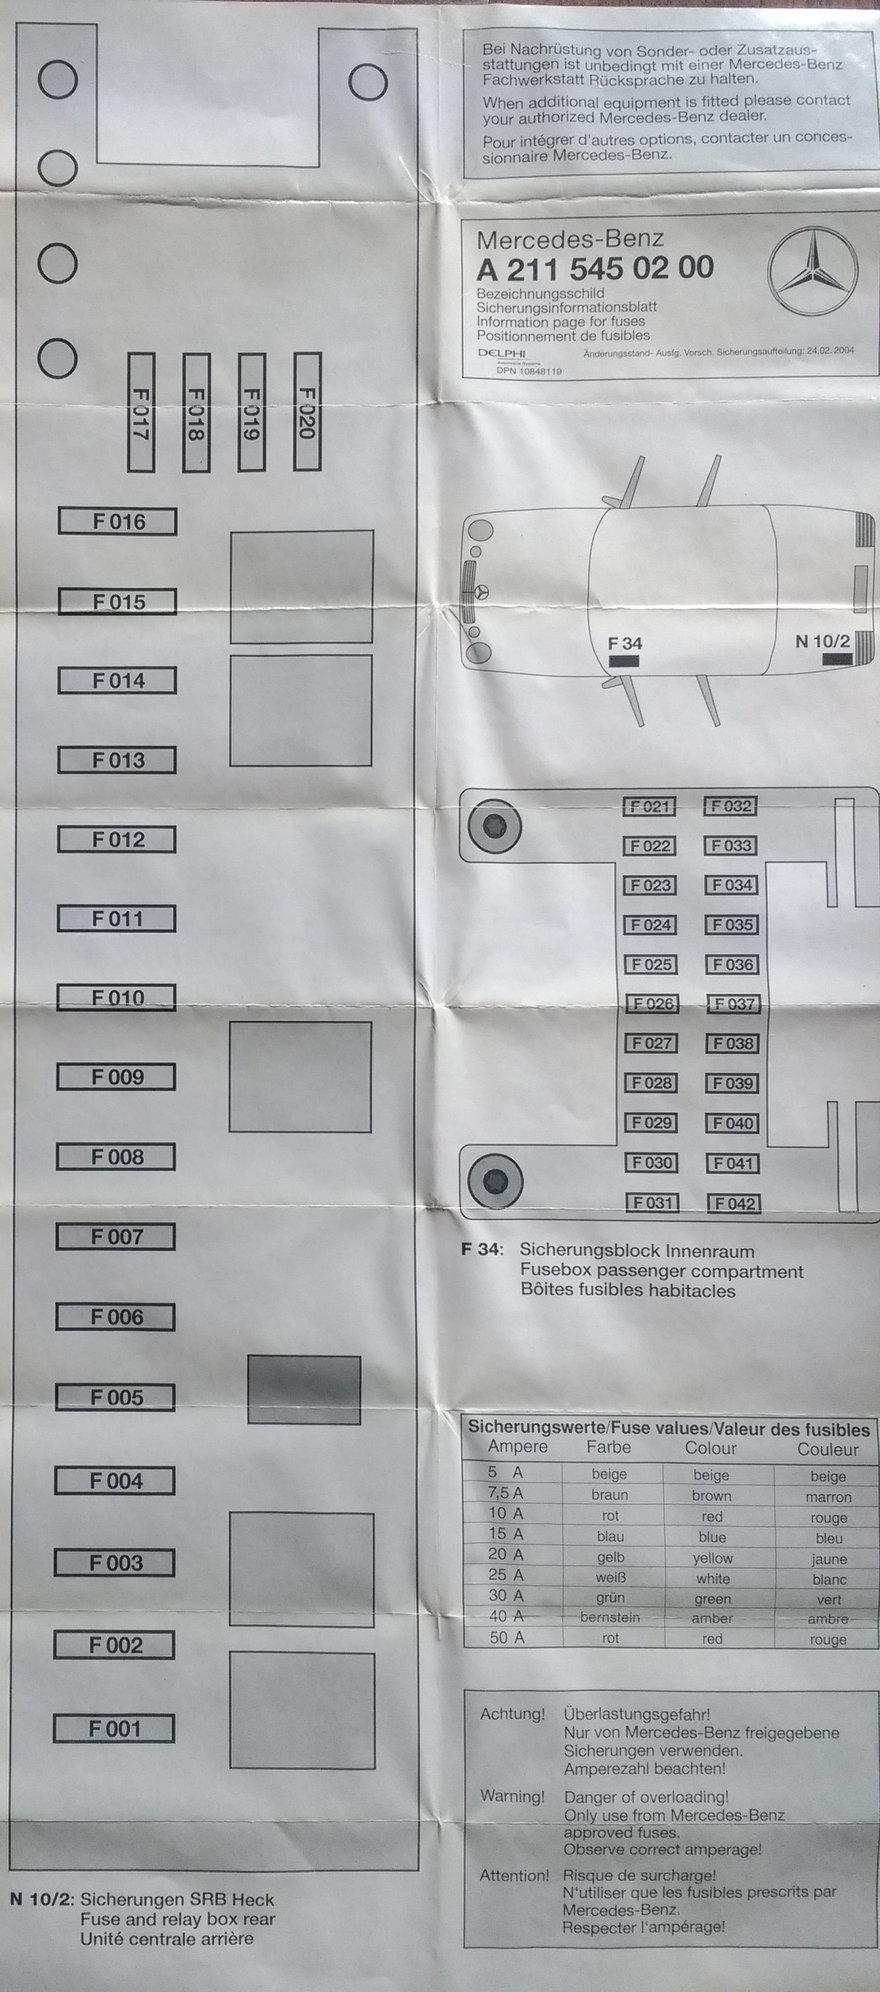 2003 Mercedes S500 Fuse Diagram  17e2a7 00 S500 Fuse Box